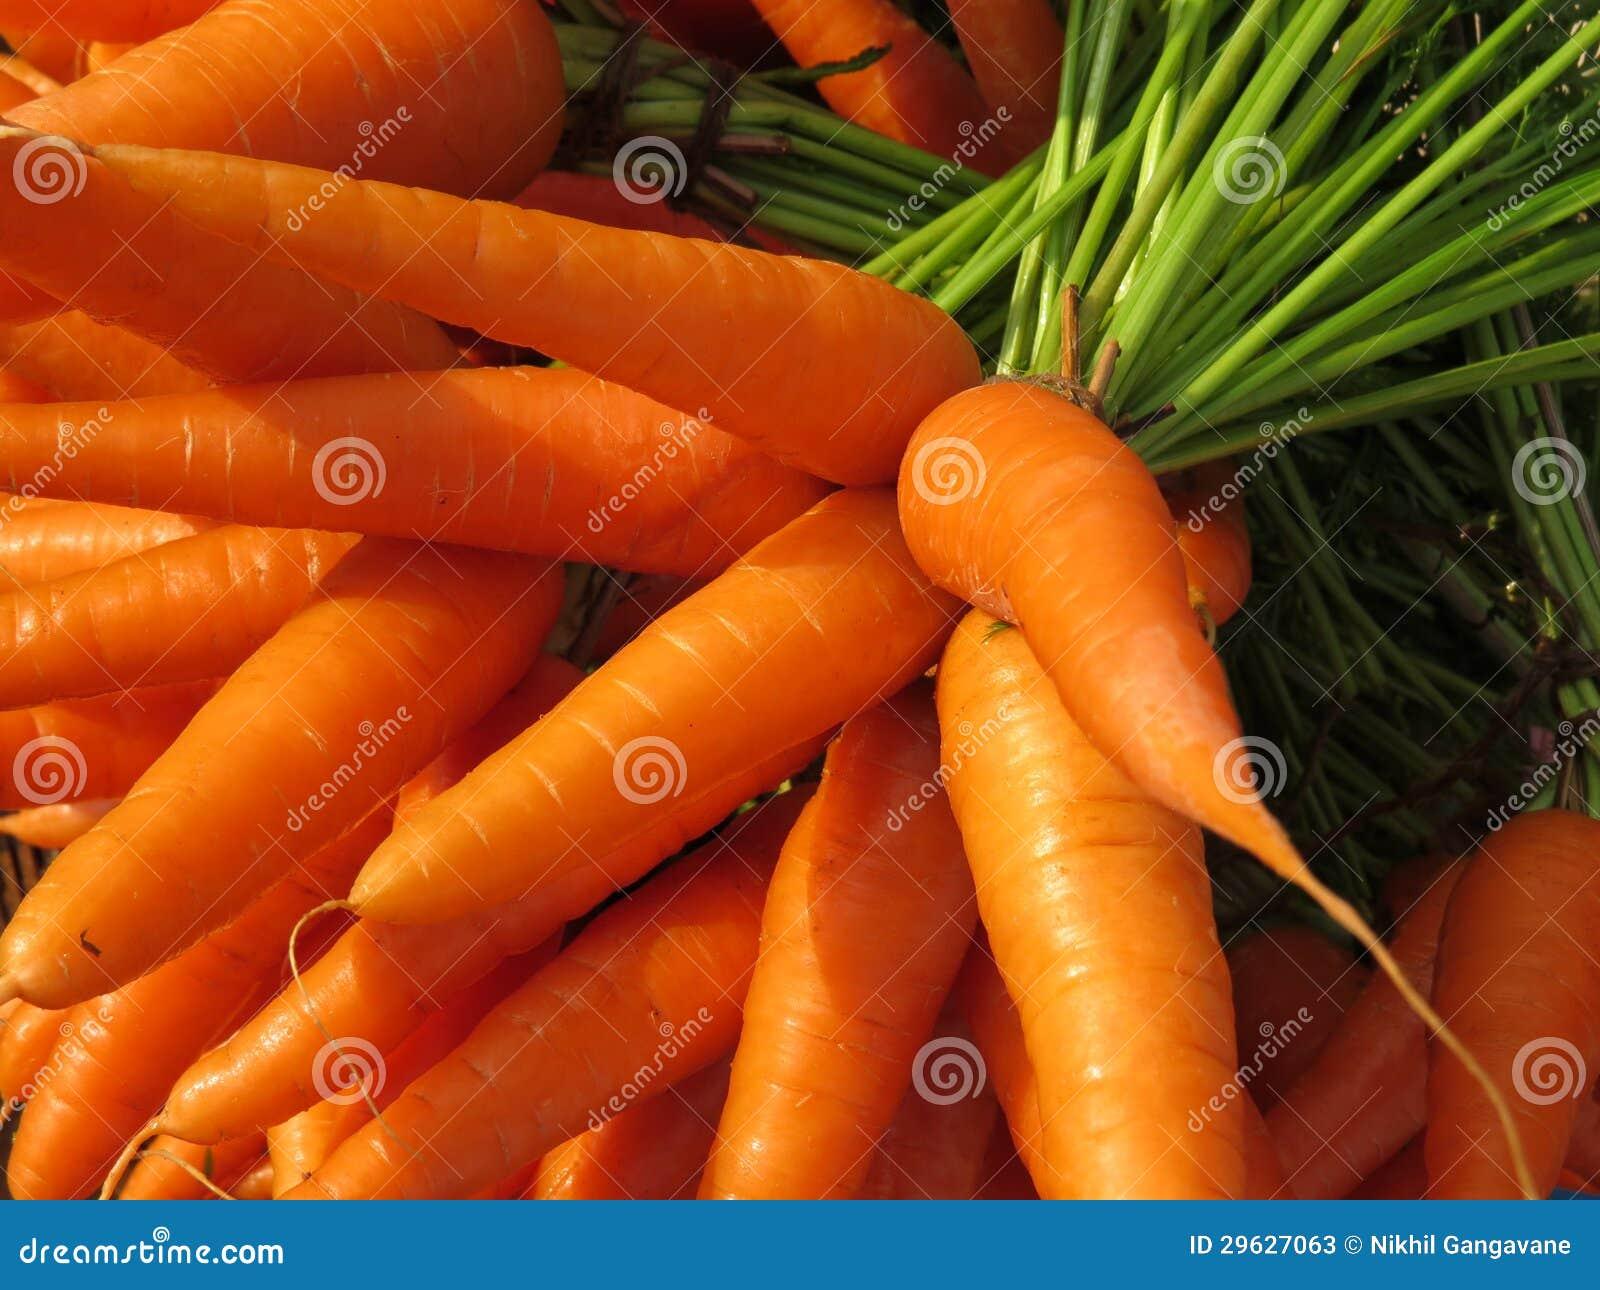 Farm Fresh Carrots Stock Photos - Image: 29627063